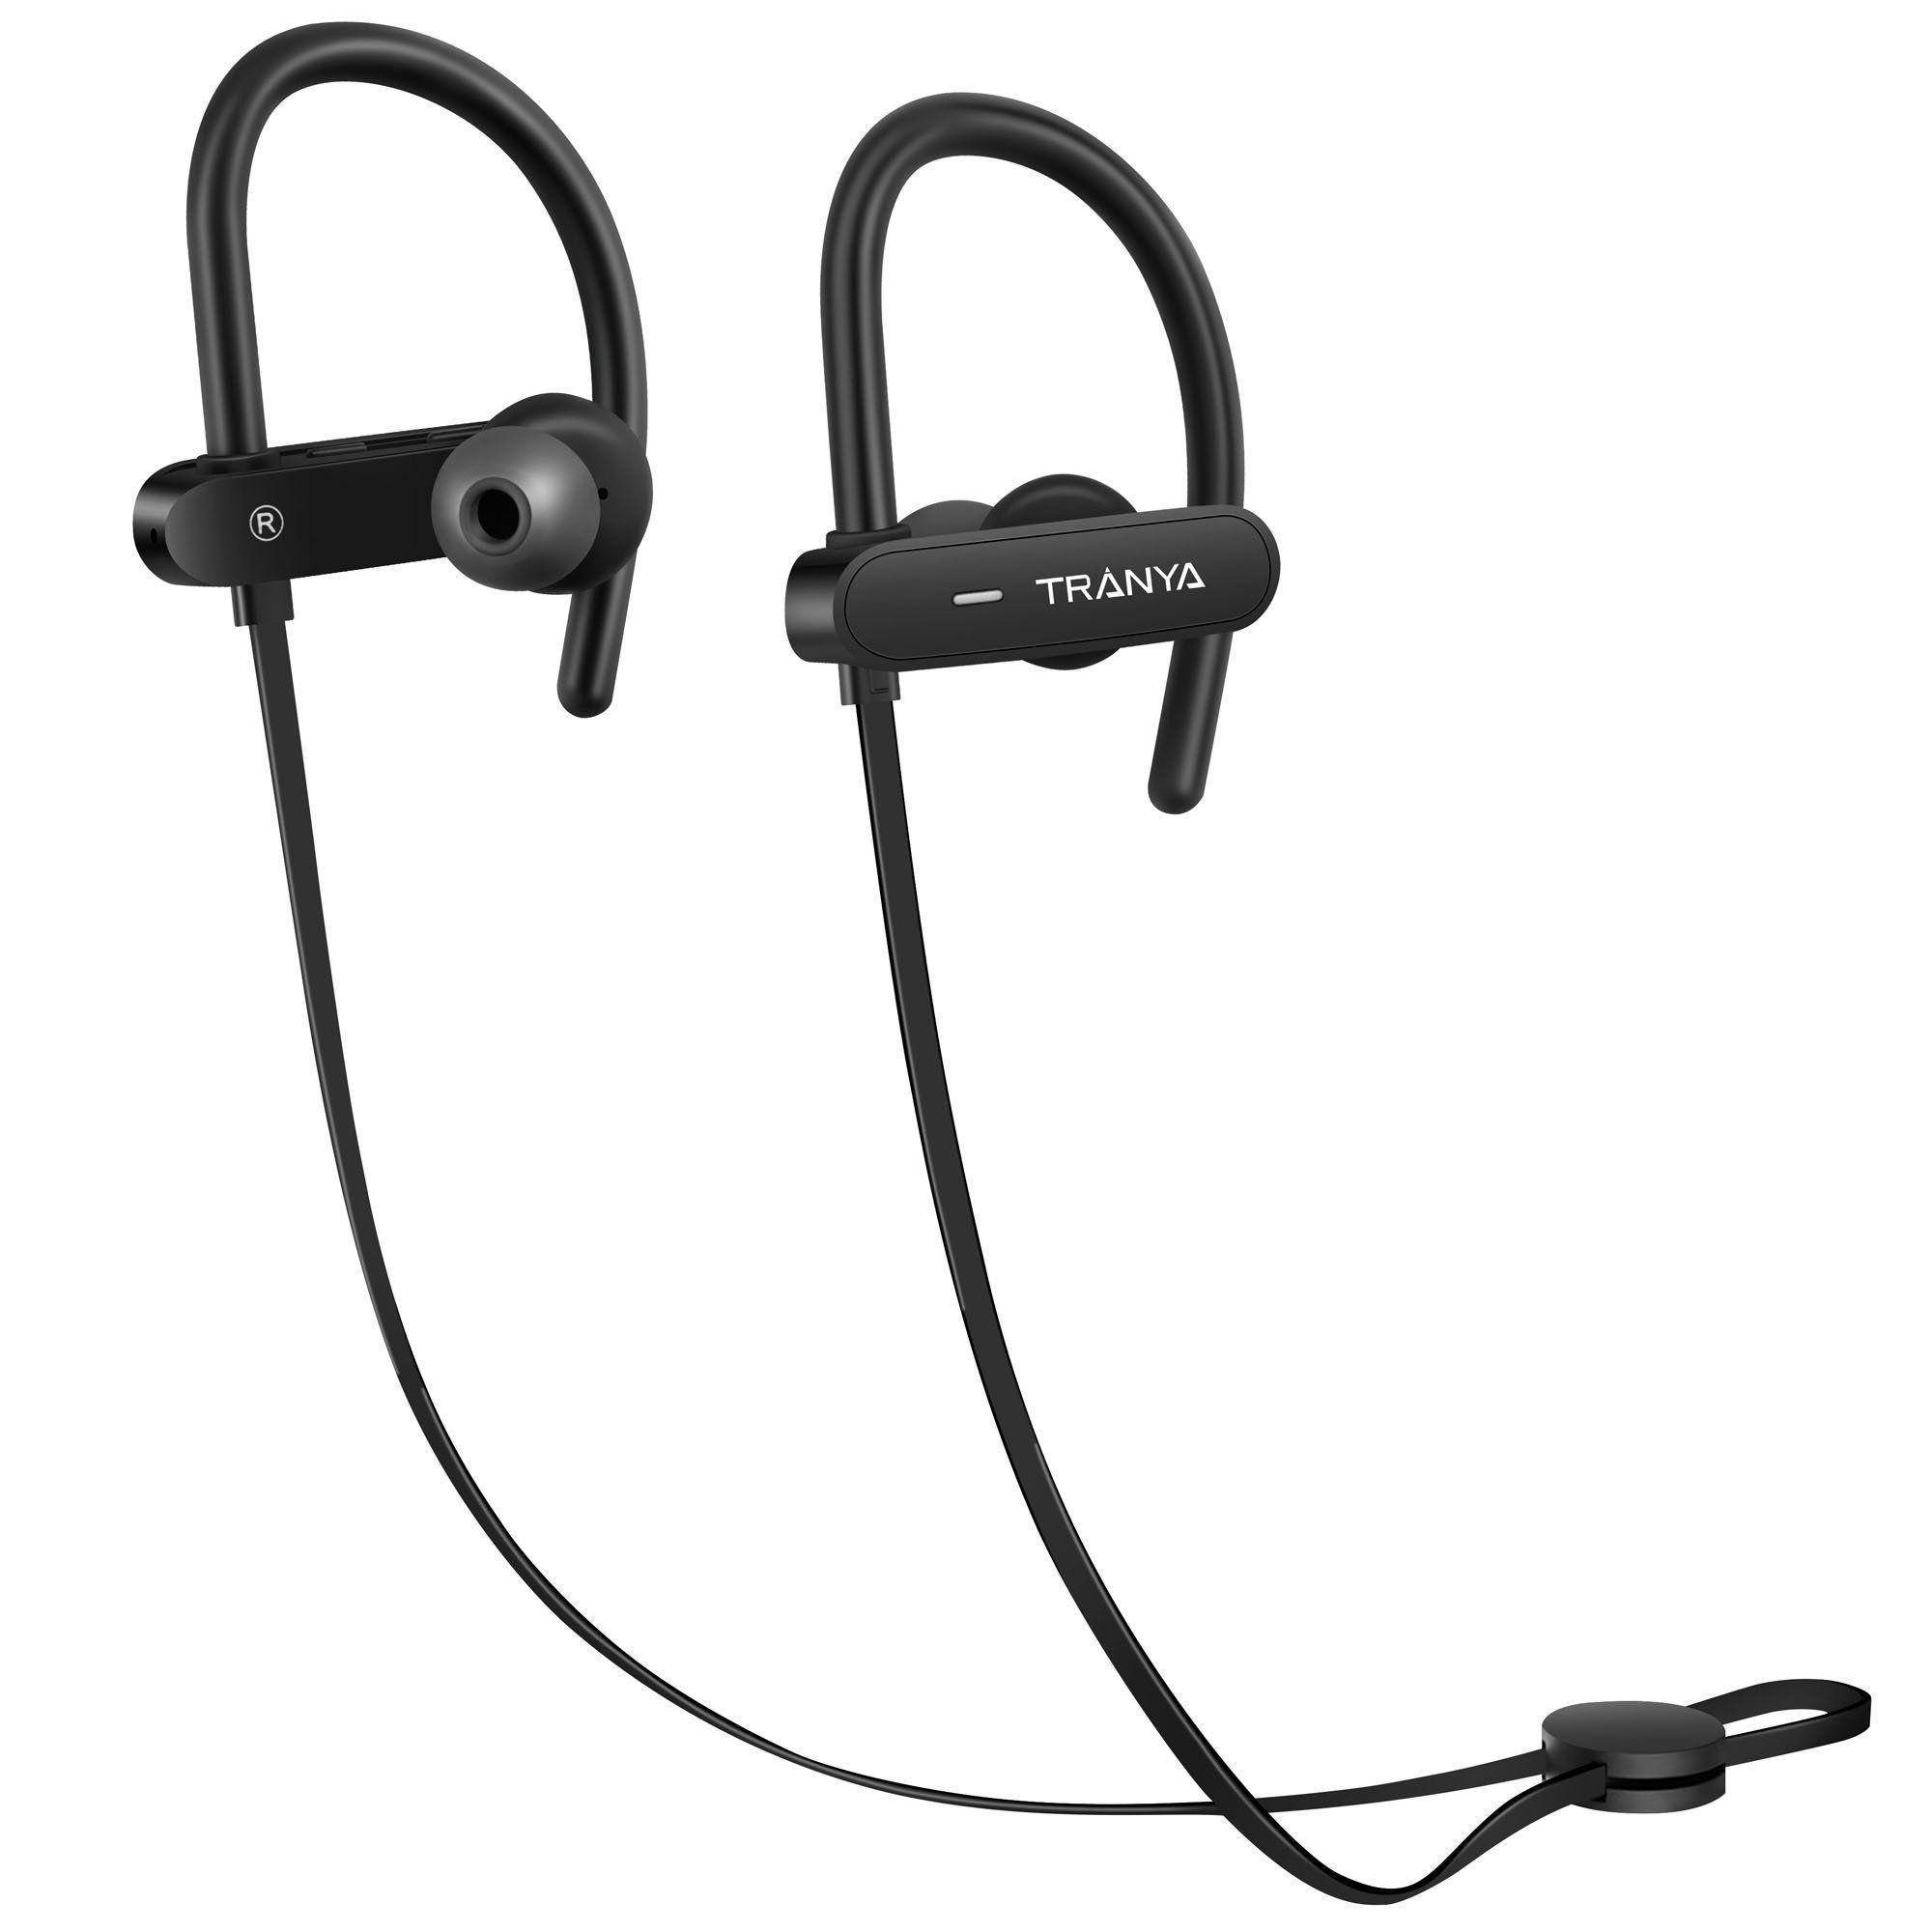 74af73f2e9b Tranya Bluetooth In-ear Wireless HD Sound Sports Headphones IPX7 Sweat  Proof, Secure Fit